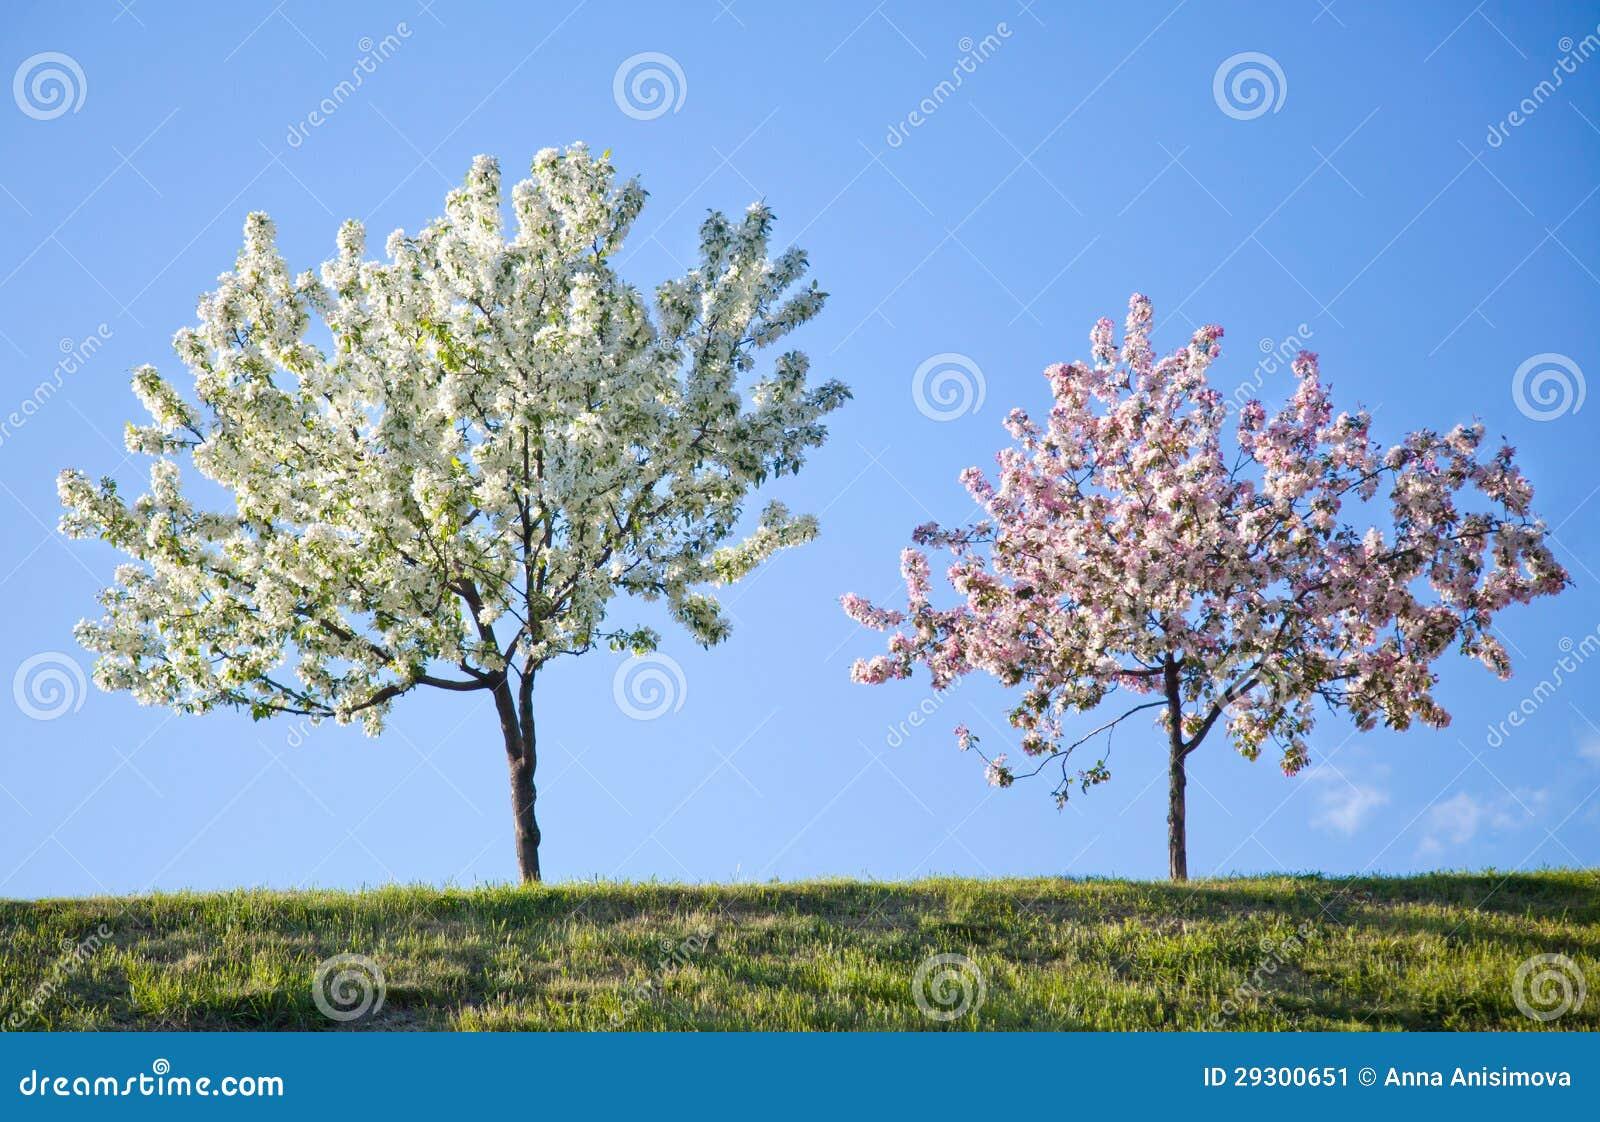 Two flowering trees against the blue sky stock image image of two flowering trees against the blue sky izmirmasajfo